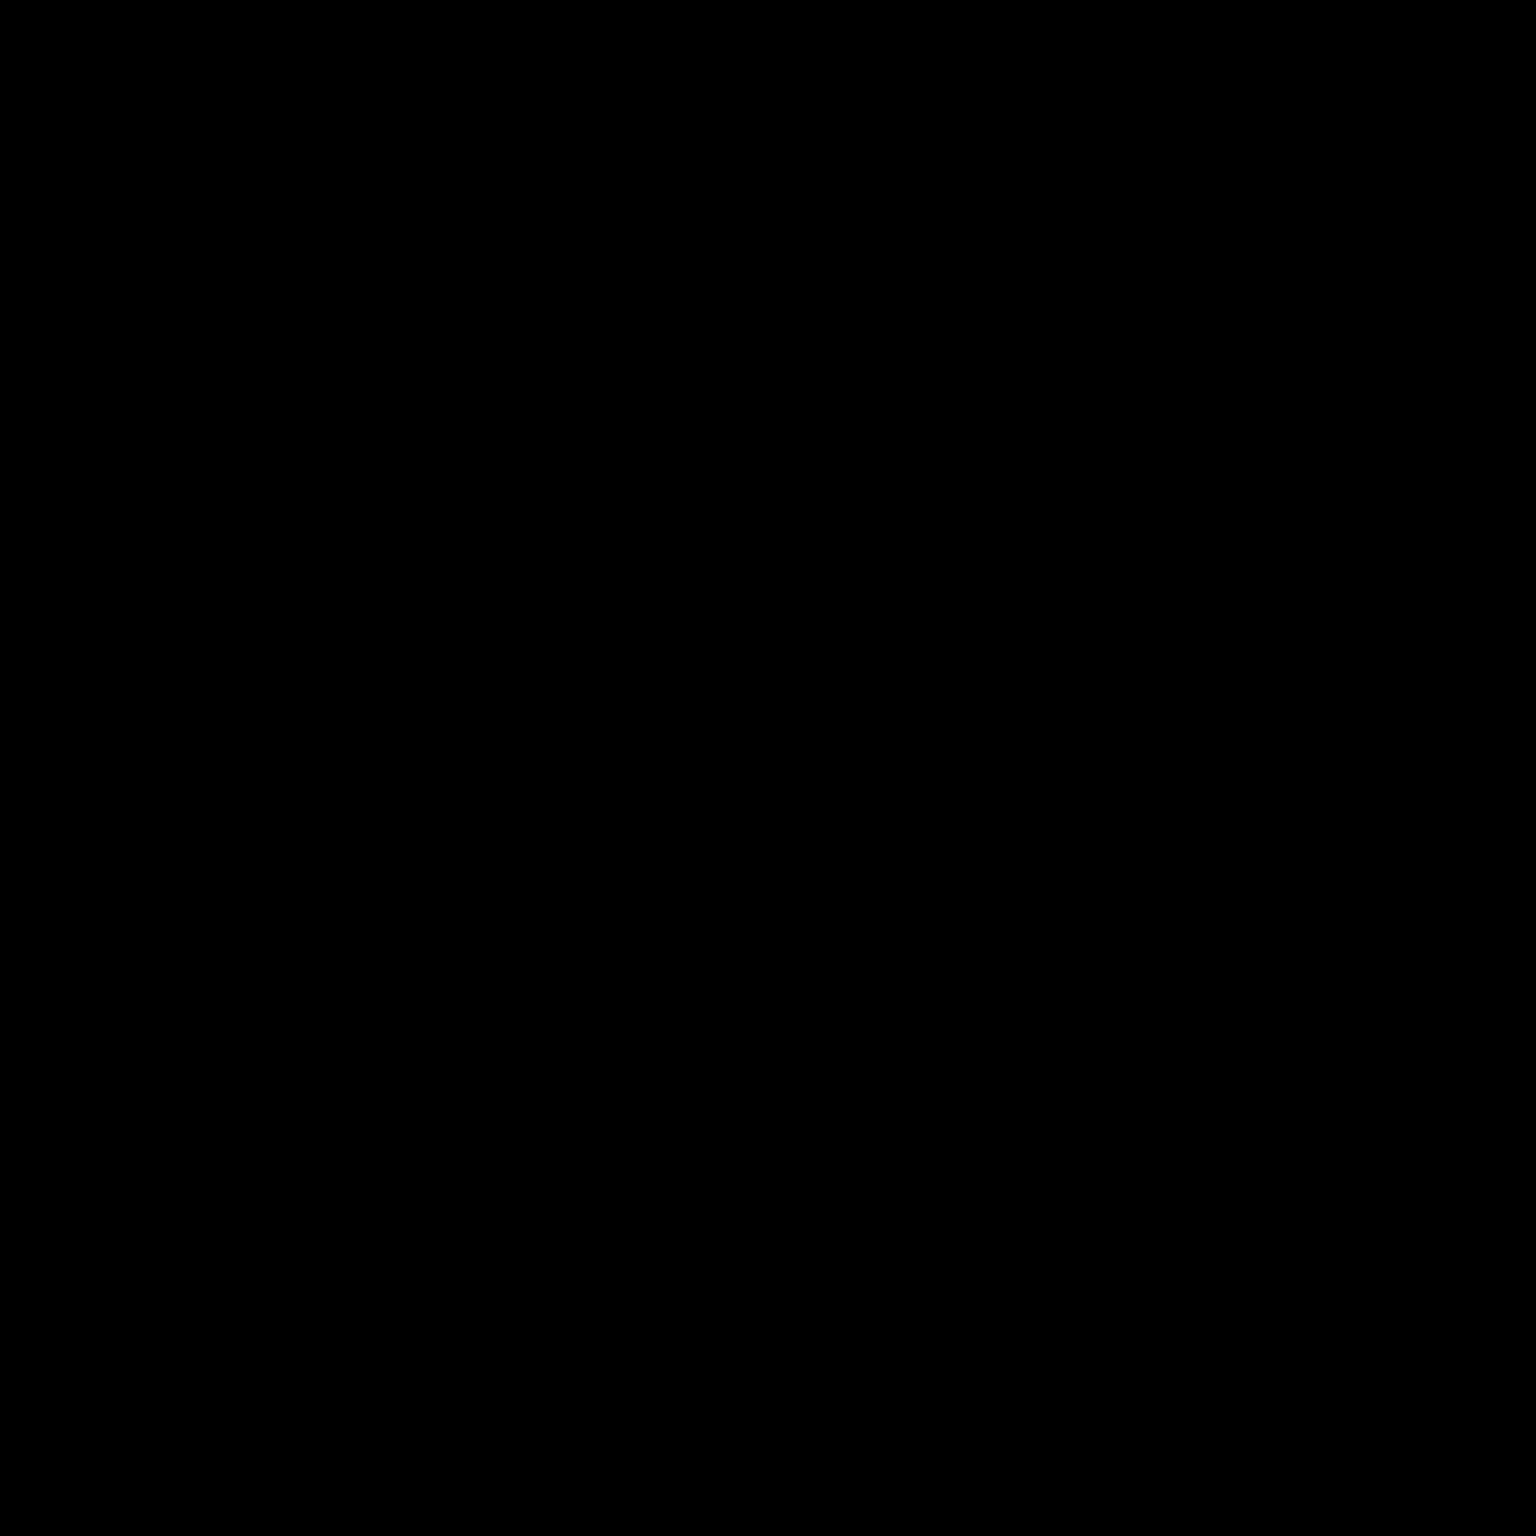 winnieolaf